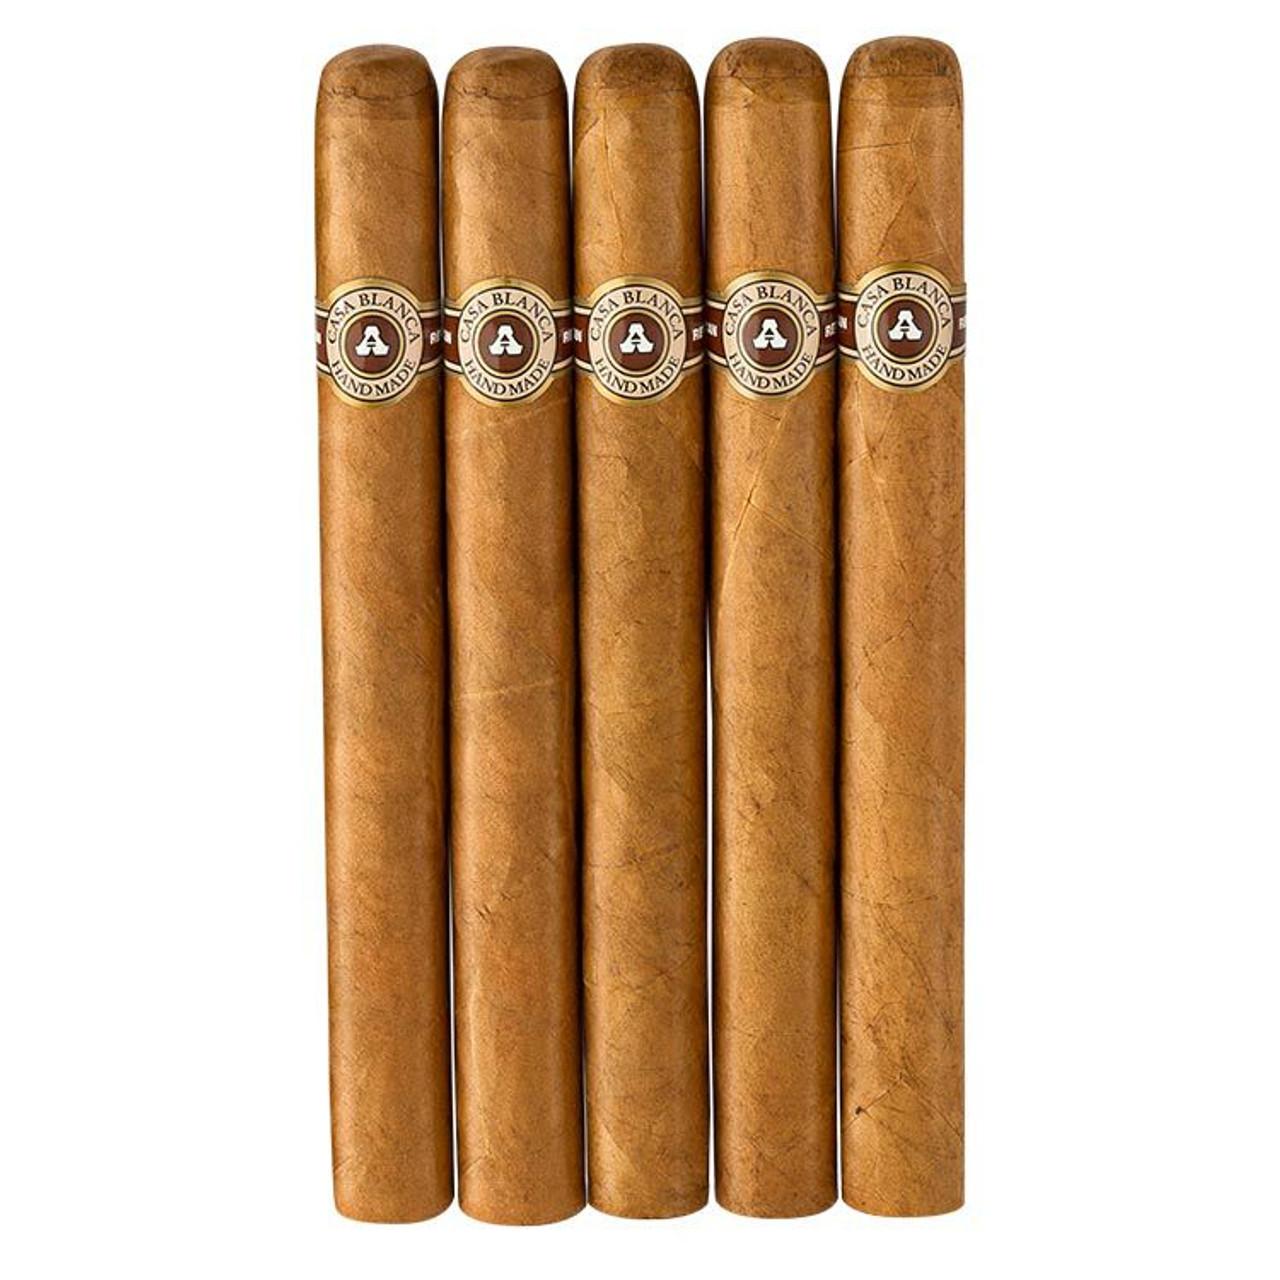 Casa Blanca President Cigars - 7.5 x 50 (Pack of 5)